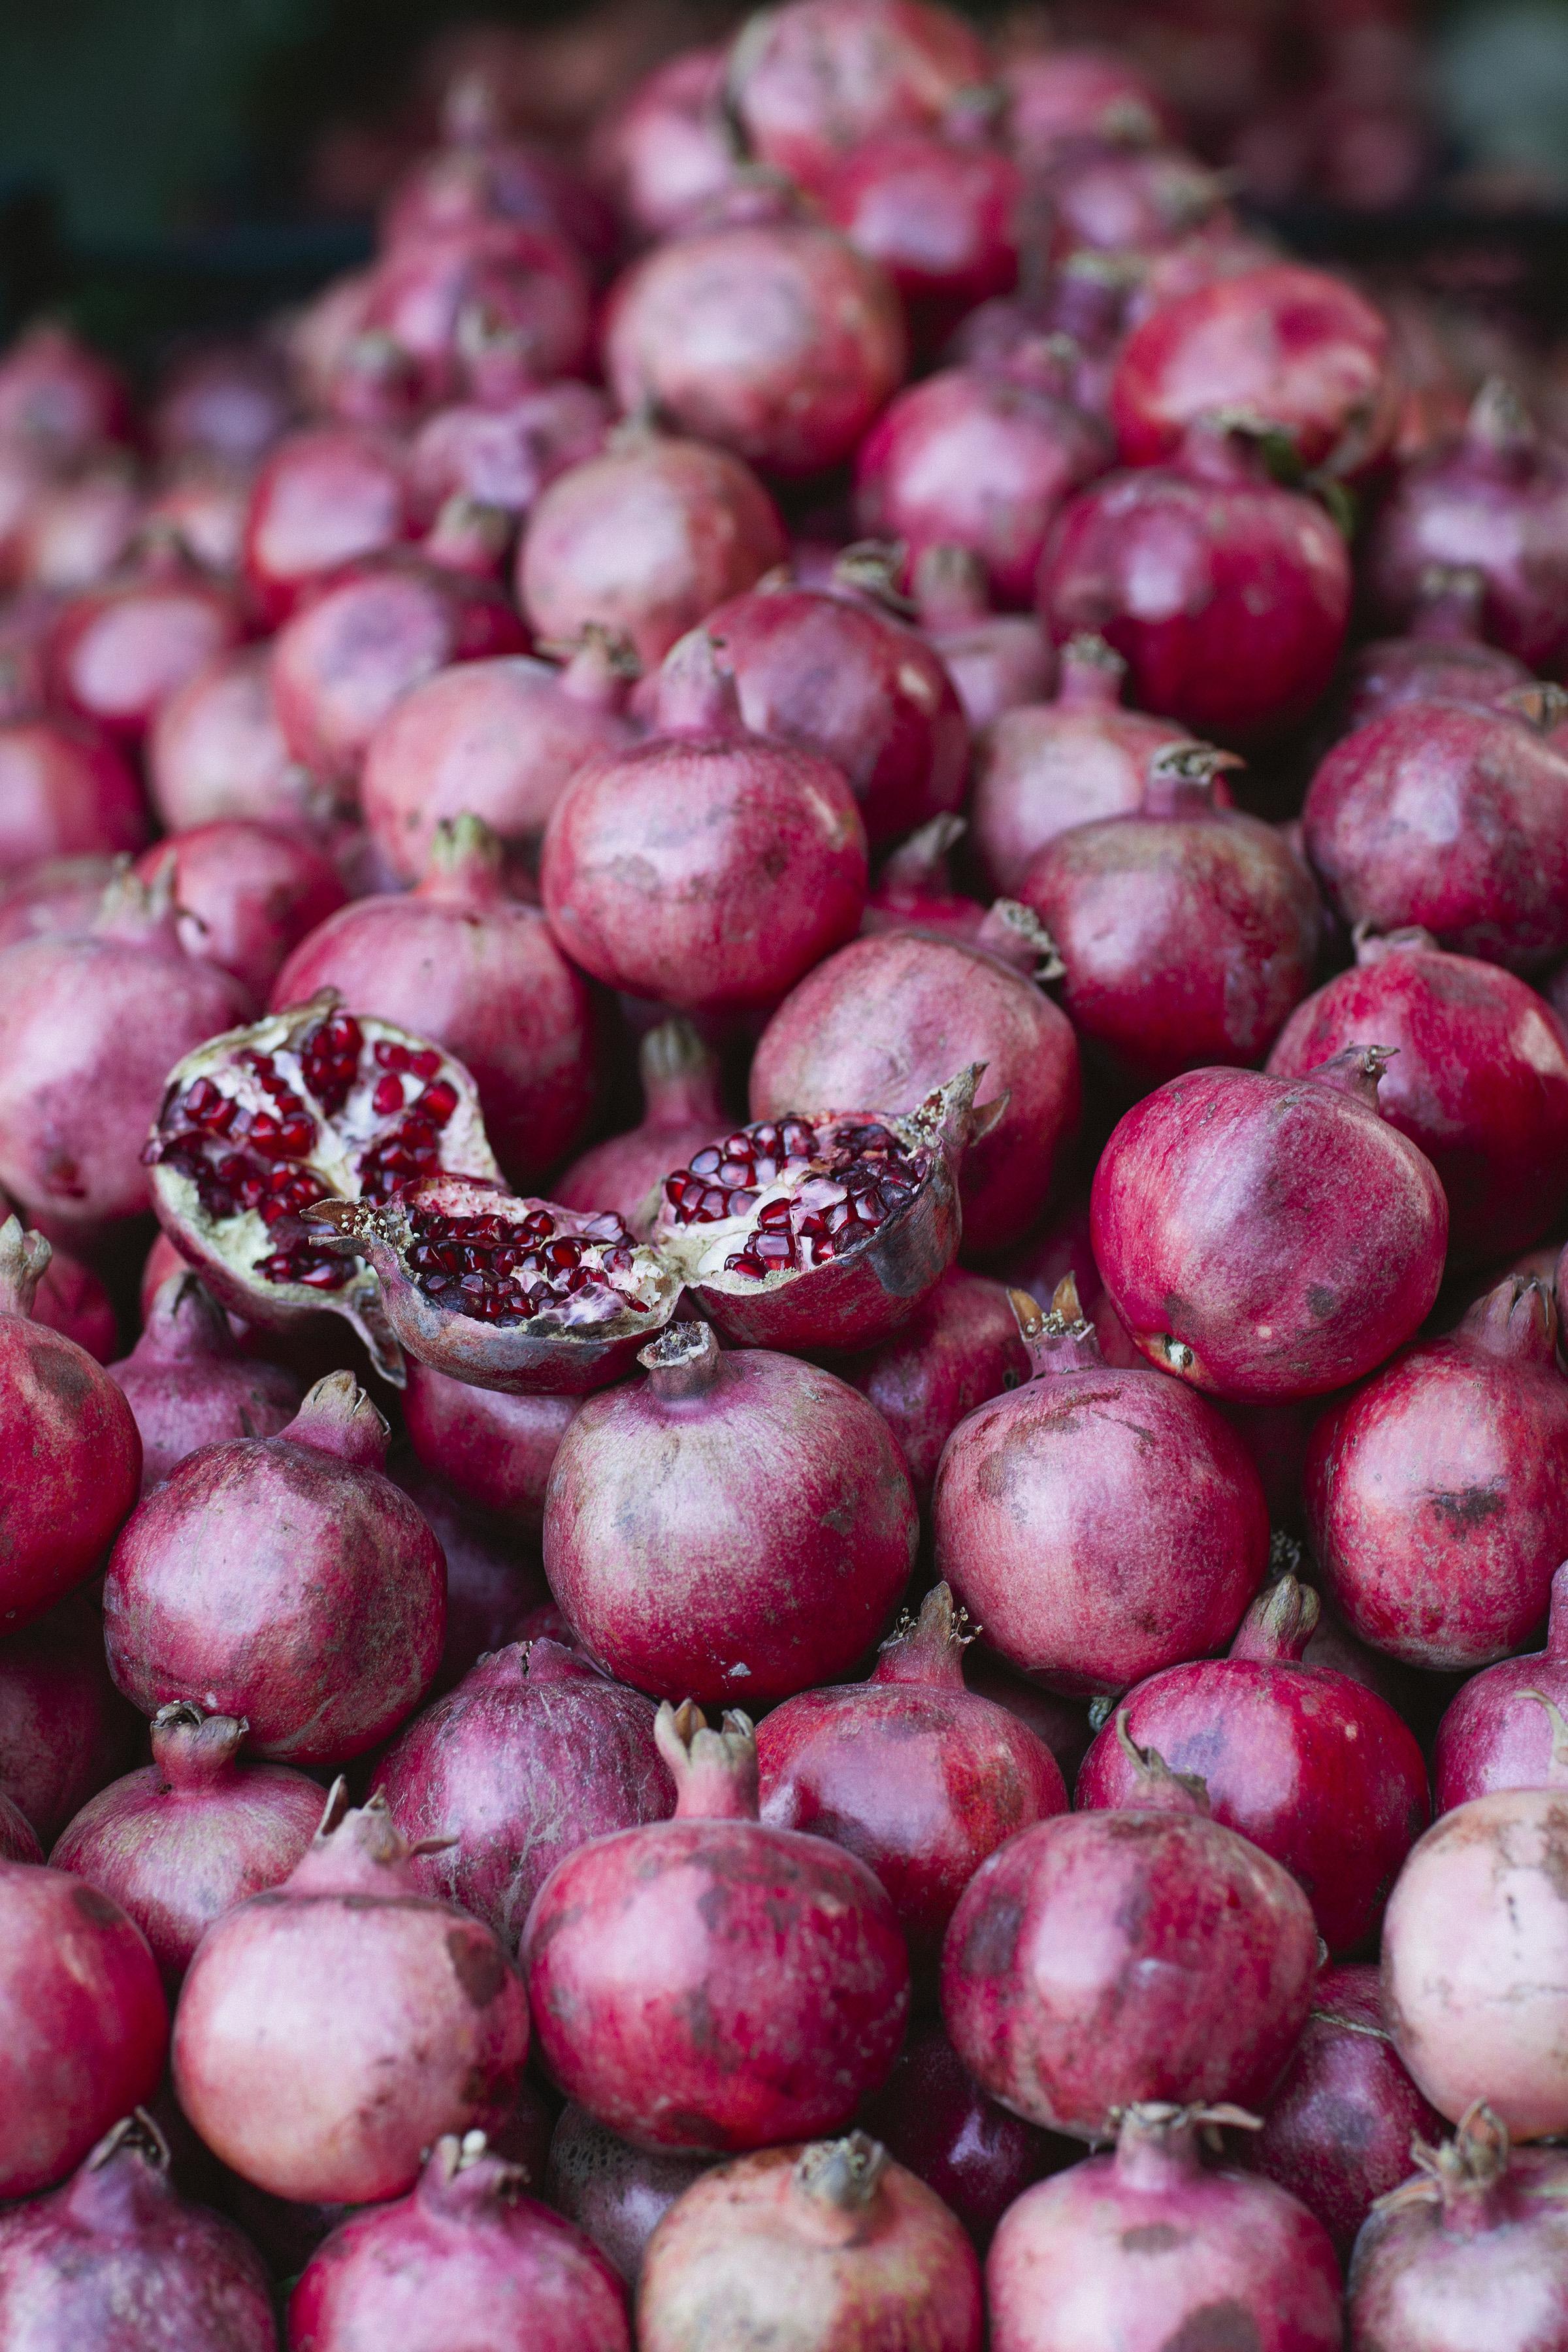 lifestyle-editorial-travel-washington-dc-malek-naz-photography-pomegranate-shomal-iran-bazaar.jpg